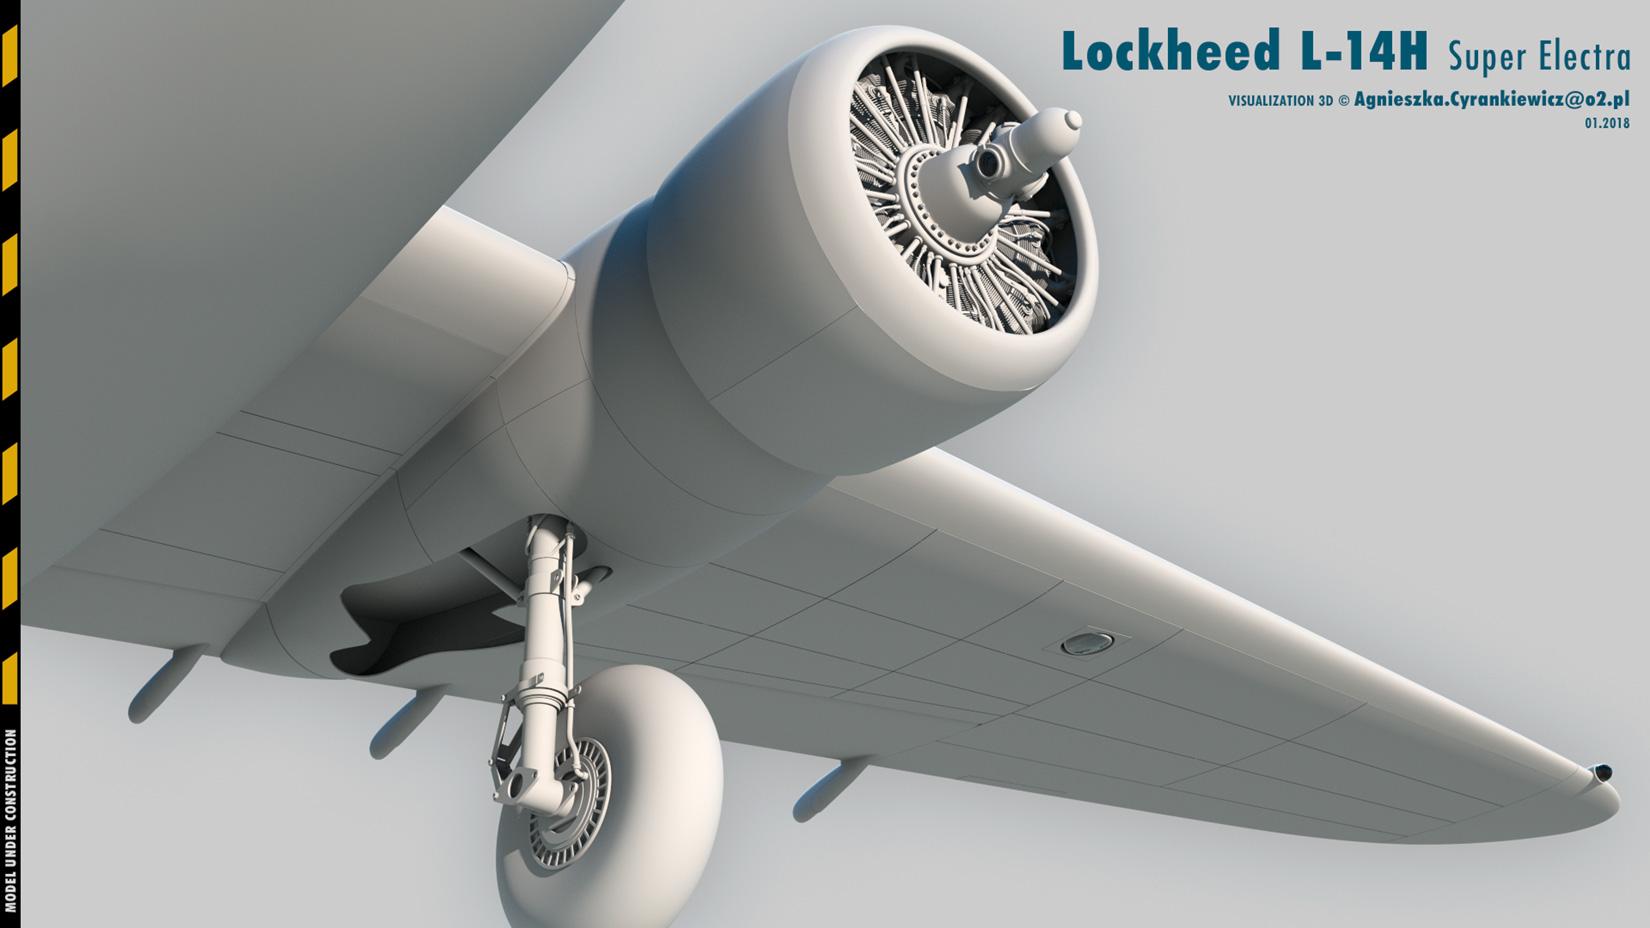 Lockheed Model 14 Super Electra, lockheed hudson